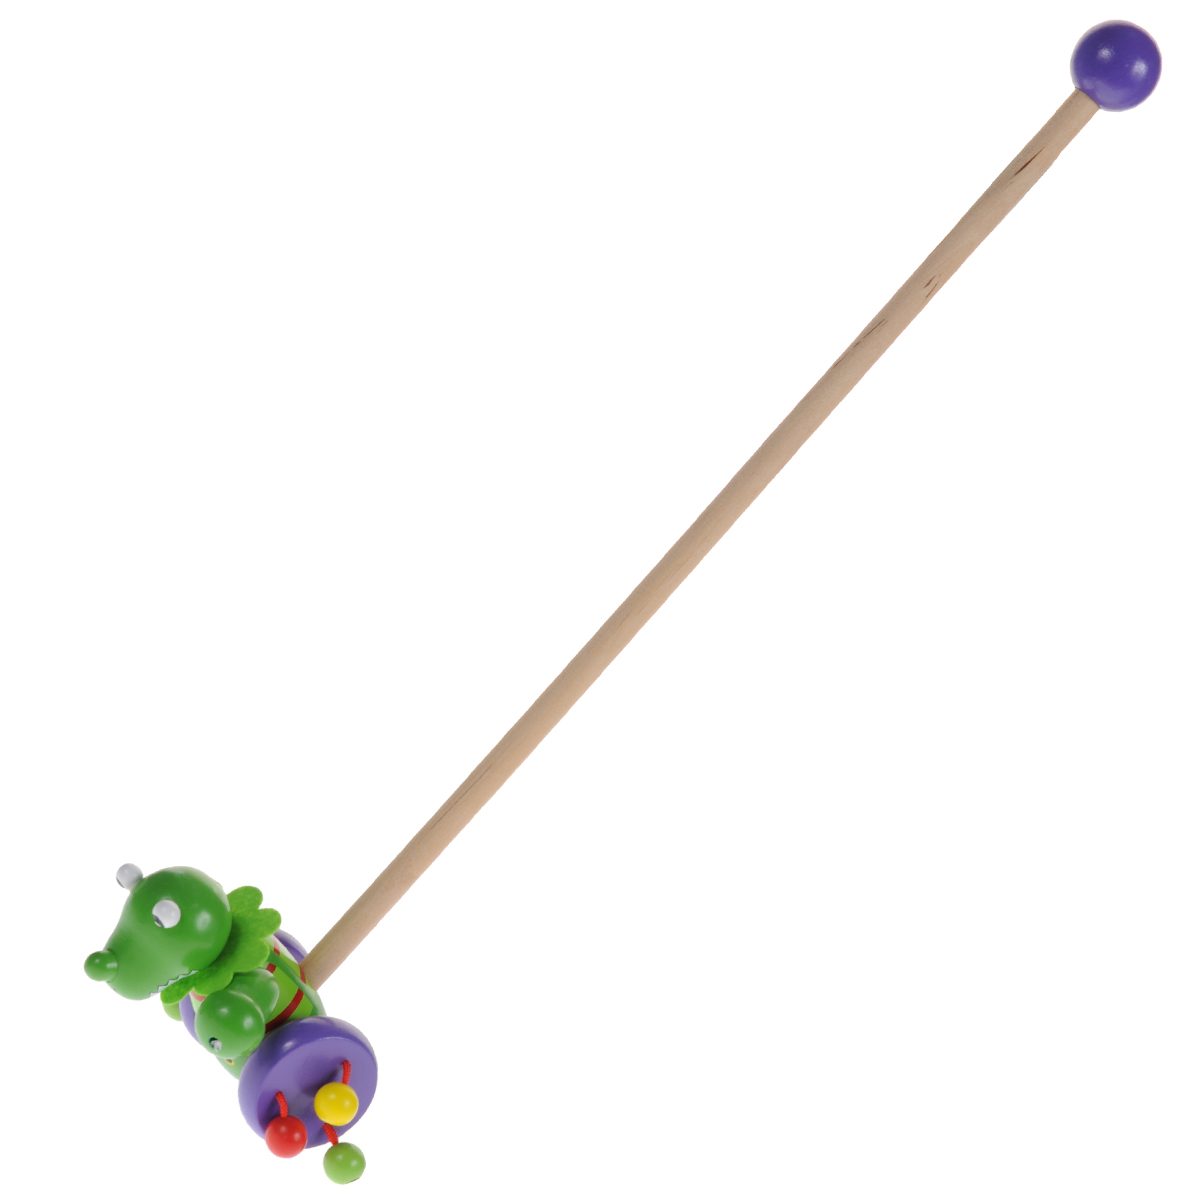 Mapacha Деревянная игрушка-каталка Динозаврик деревянные игрушки mapacha сортер каталка машинка